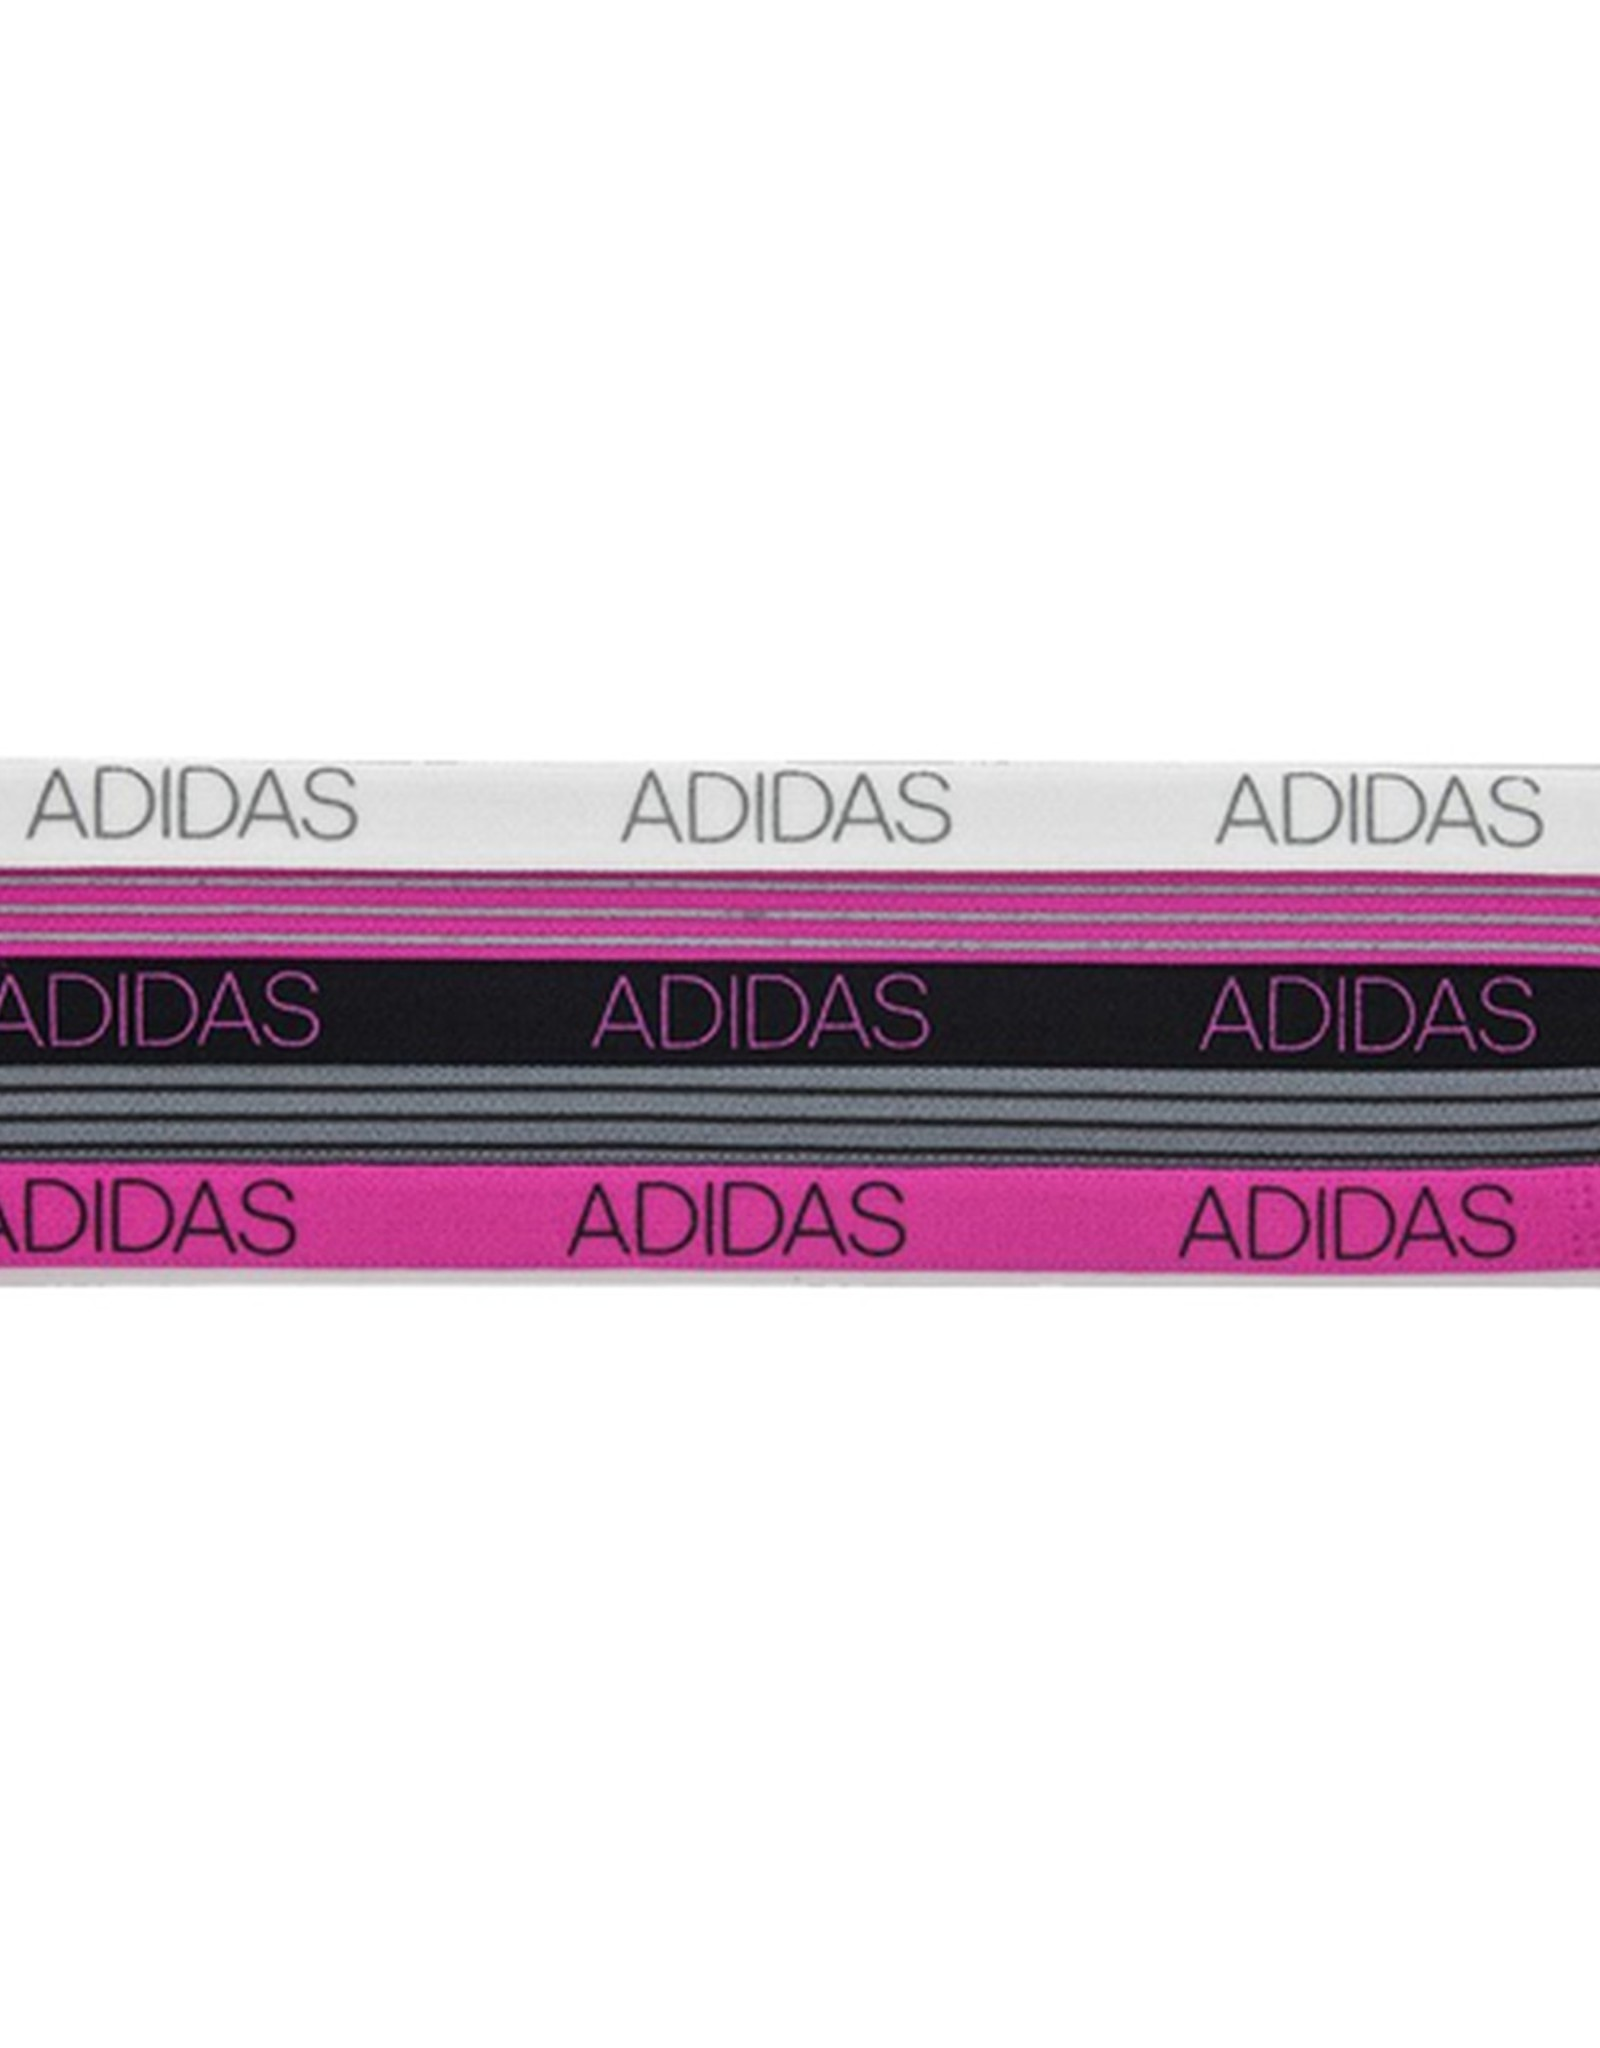 Adidas Creator + Hairbands